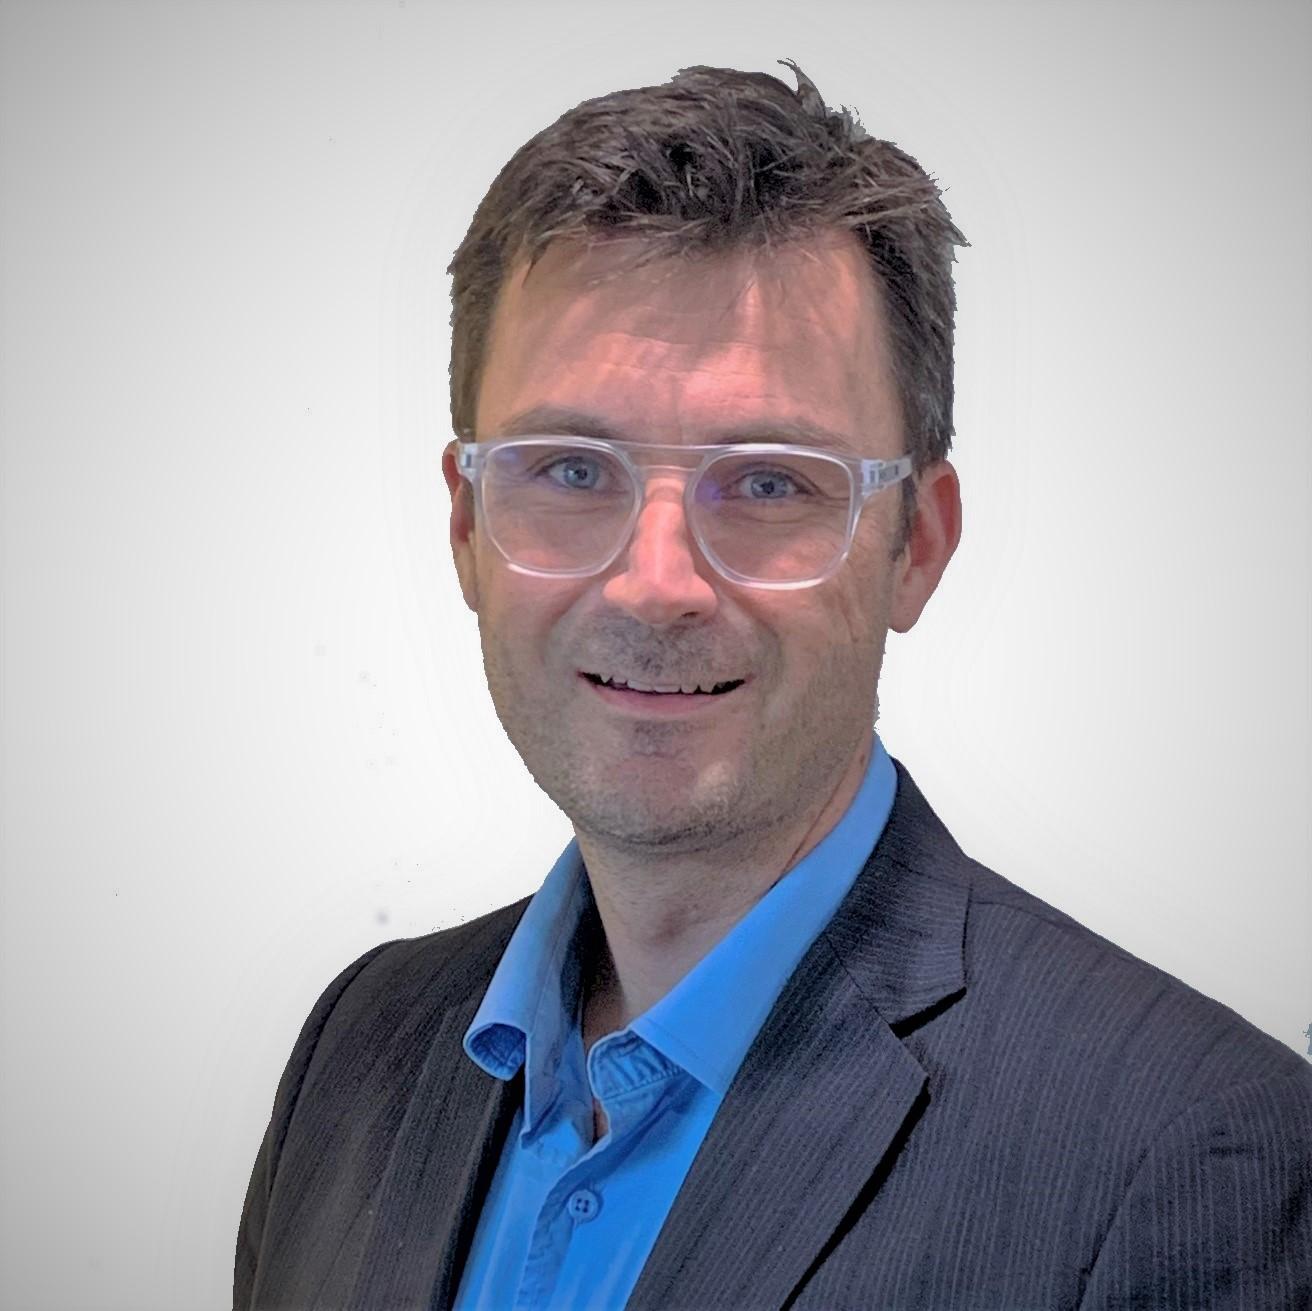 <b>Sébastien Bergeron</b> <br> Ph. D.